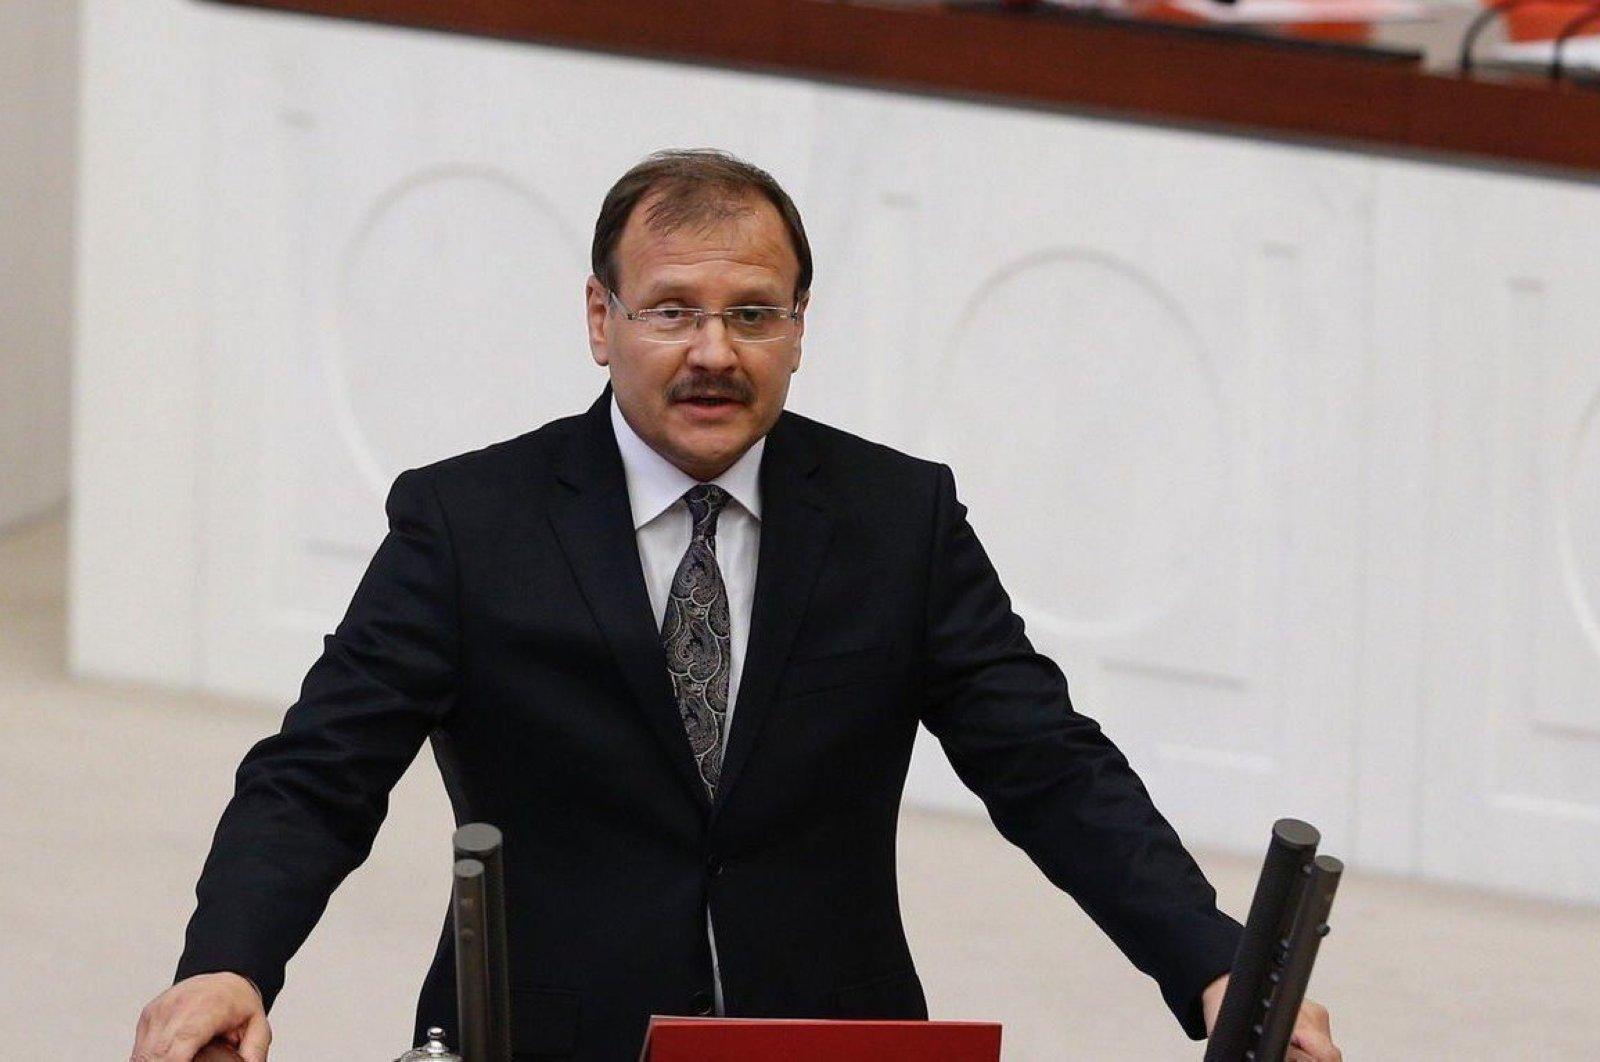 Hakan Çavuşoğlu, head of the Turkish Parliament's Human Rights Commission, speaks at the General Assembly, Ankara, Turkey, April 30, 2020. (AA File Photo)